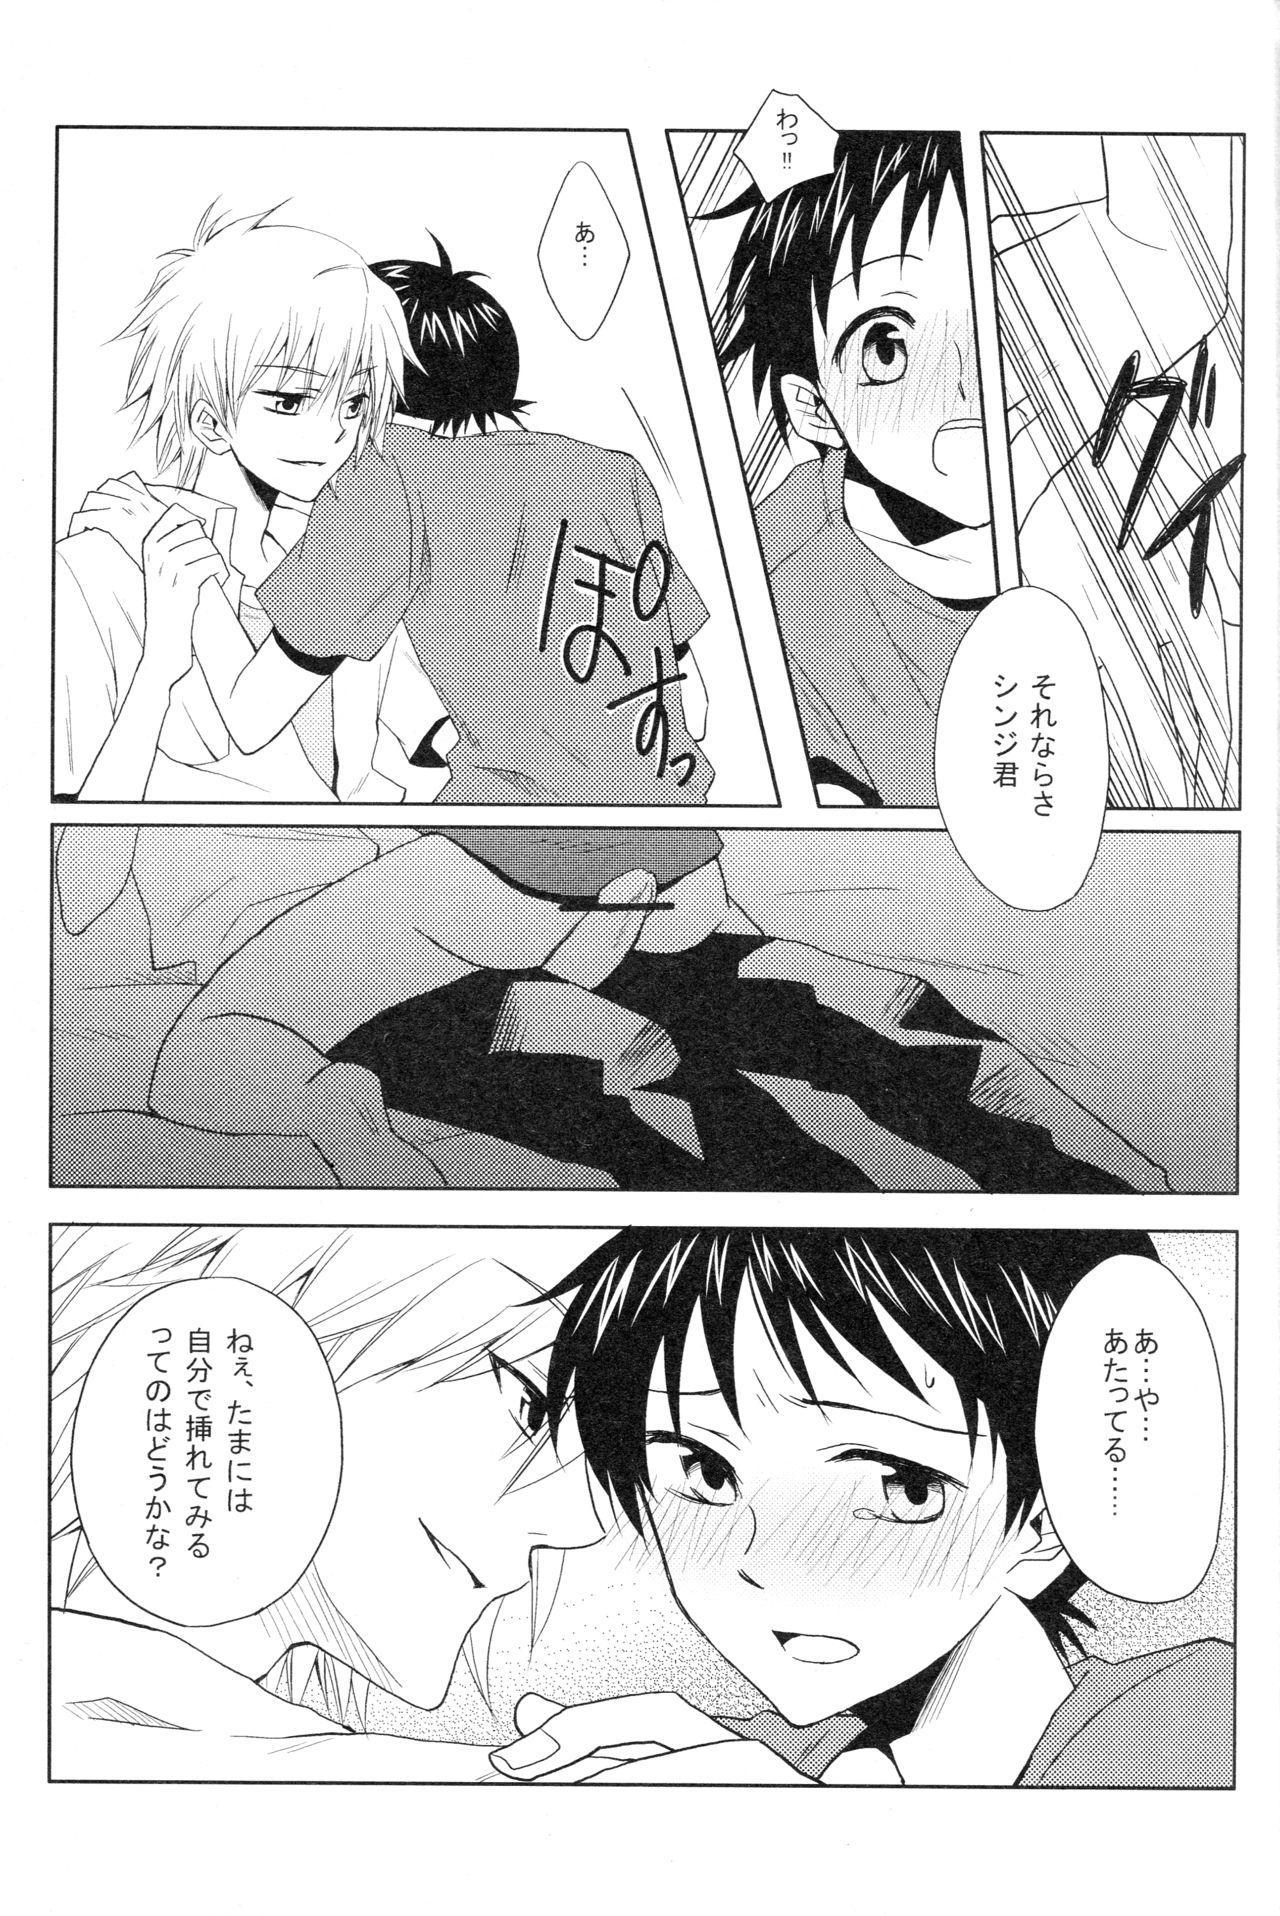 PSP Eva 2 no Susume 11